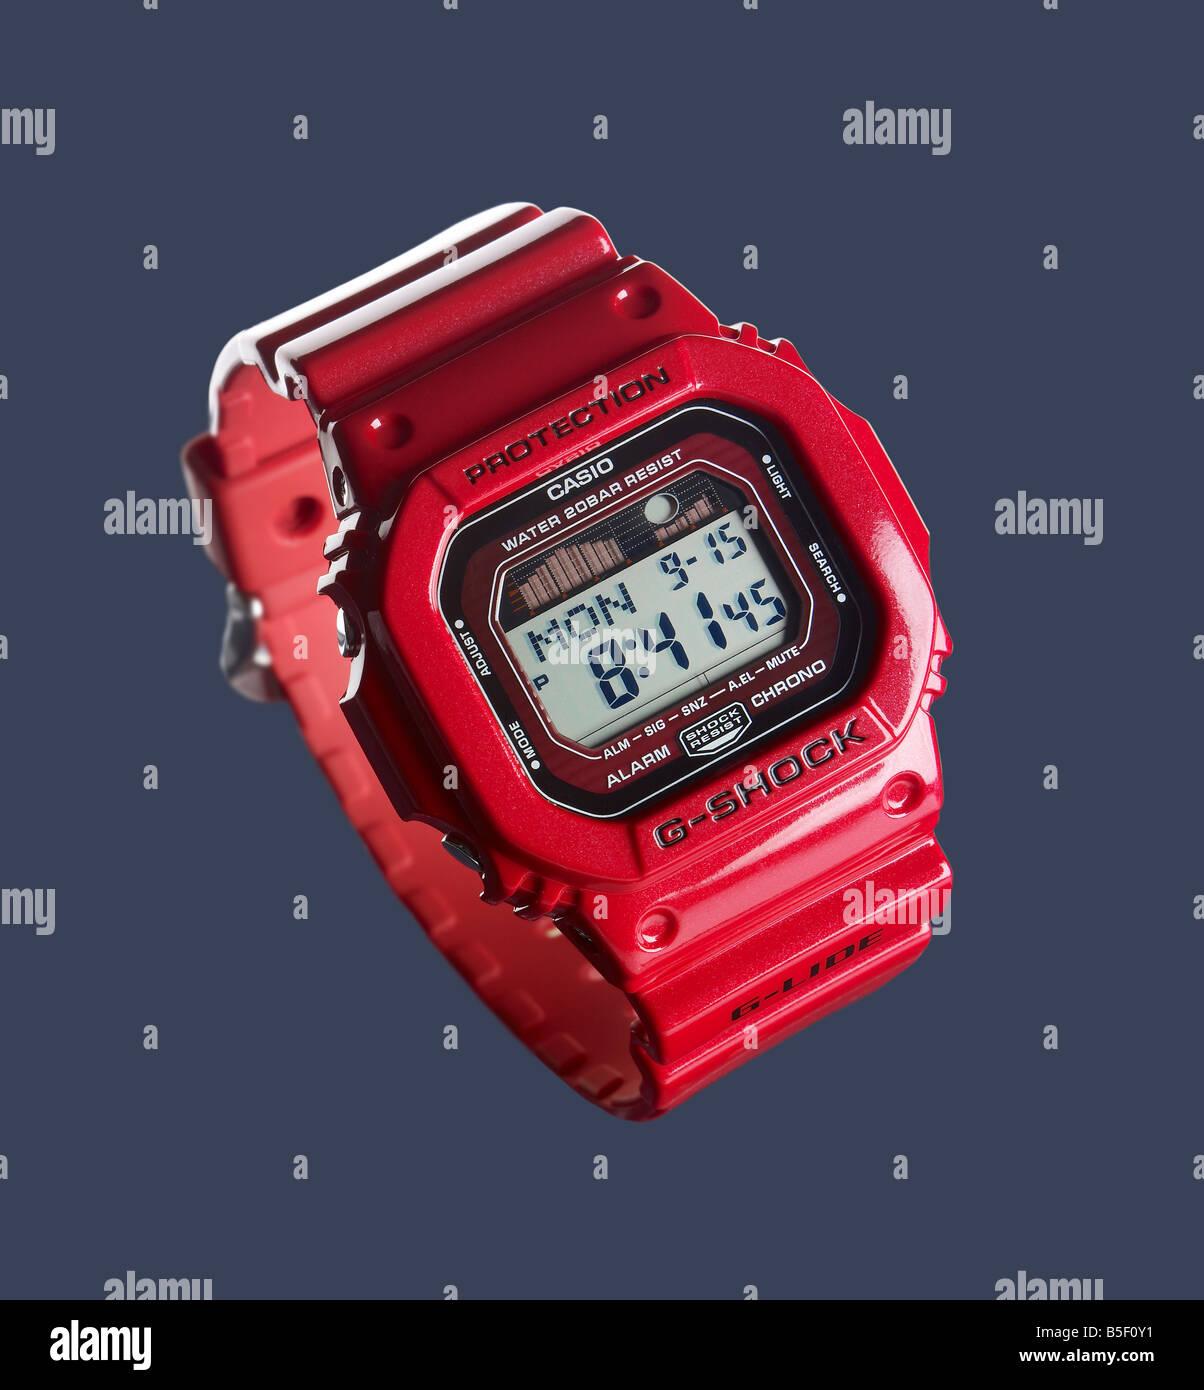 Casio red wrist watch - Stock Image